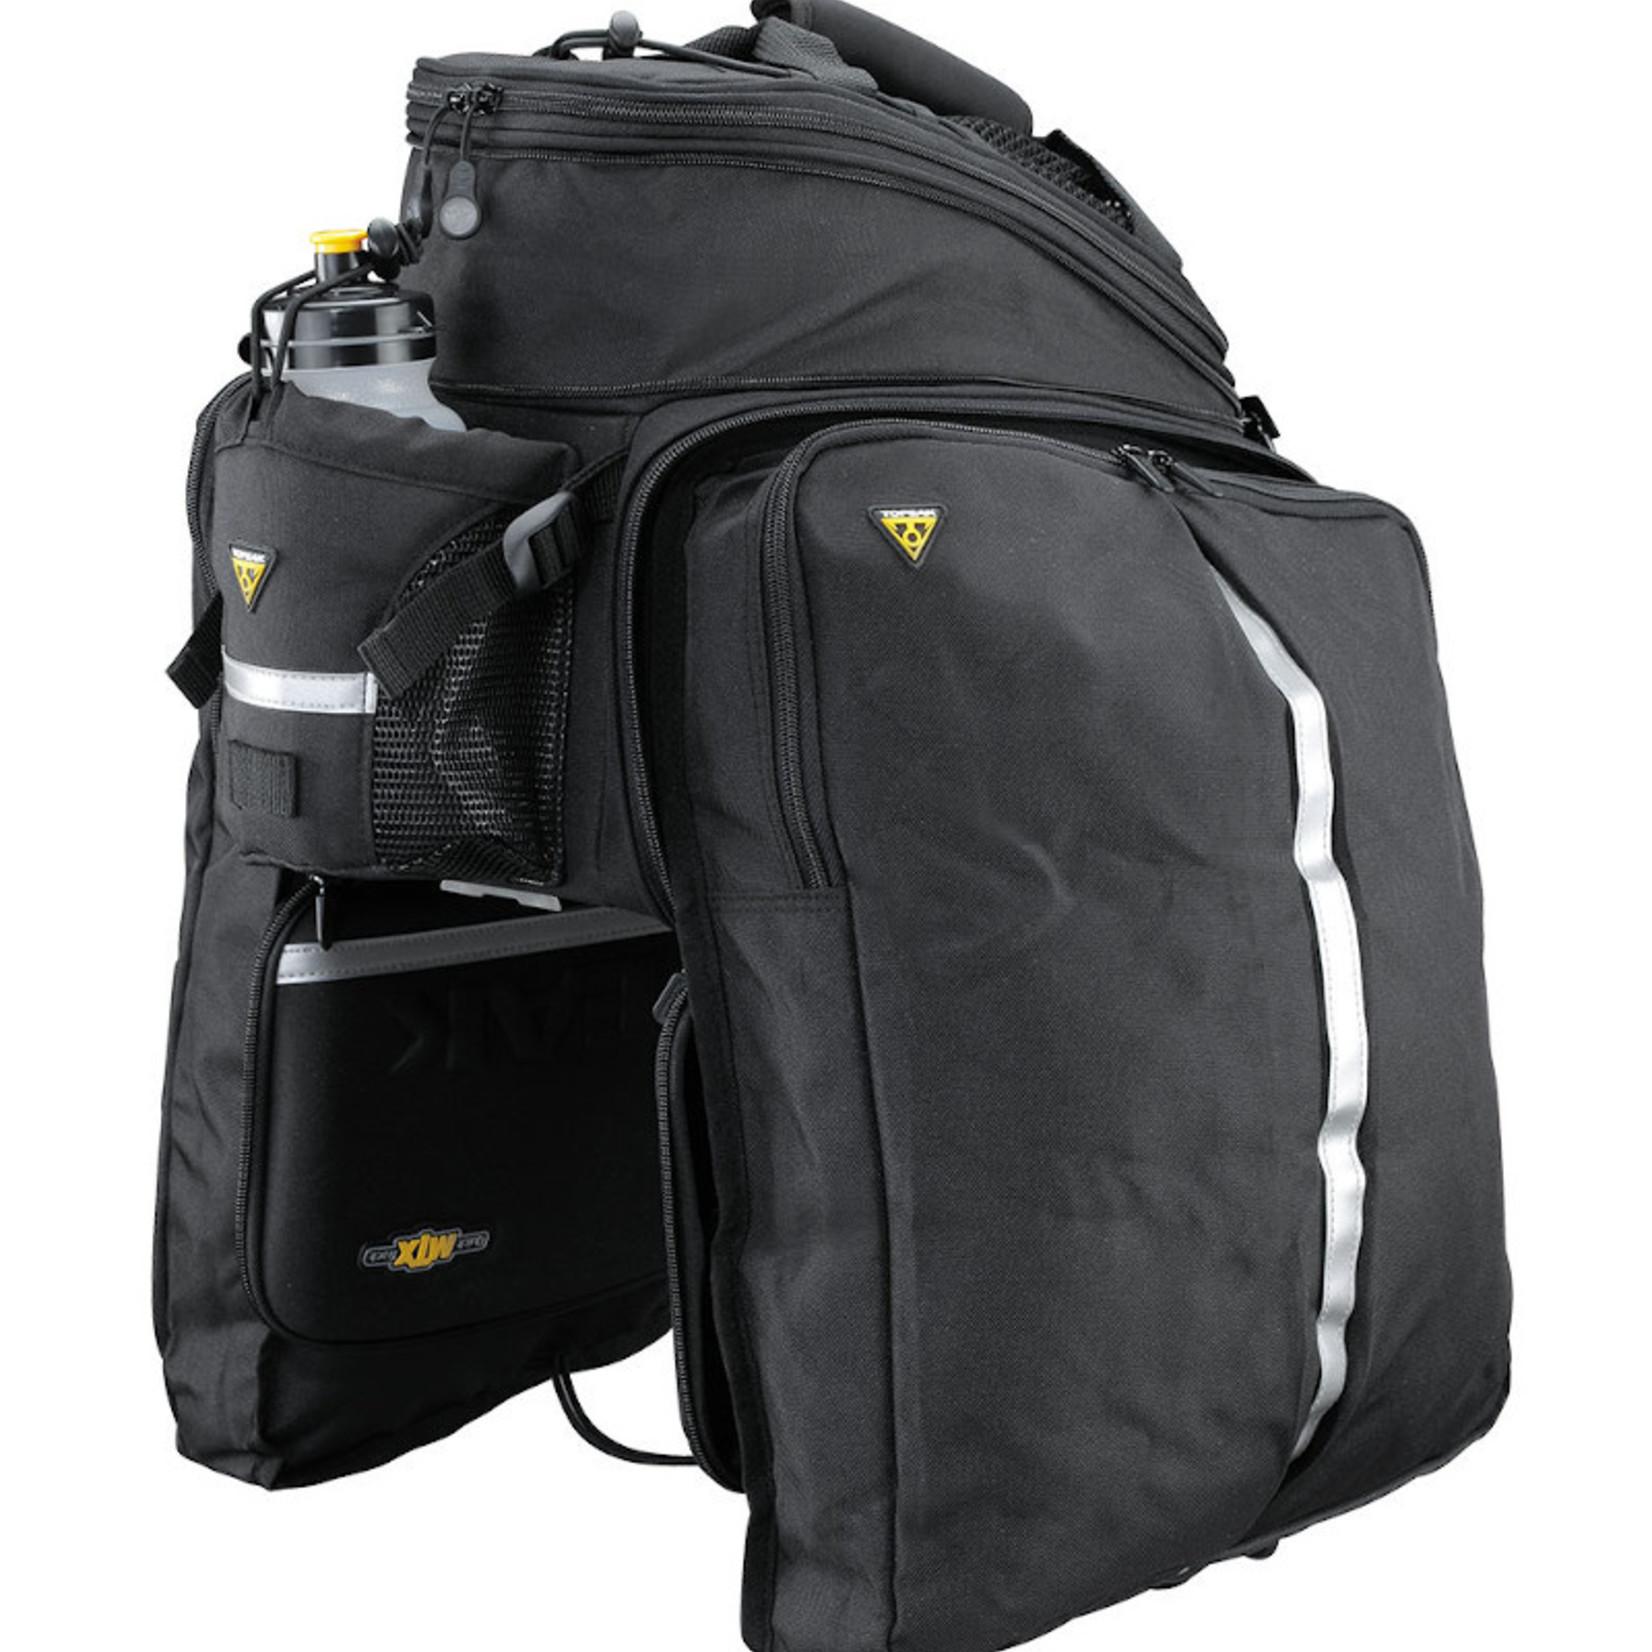 Topeak Topeak - MTX Trunk bag DXP